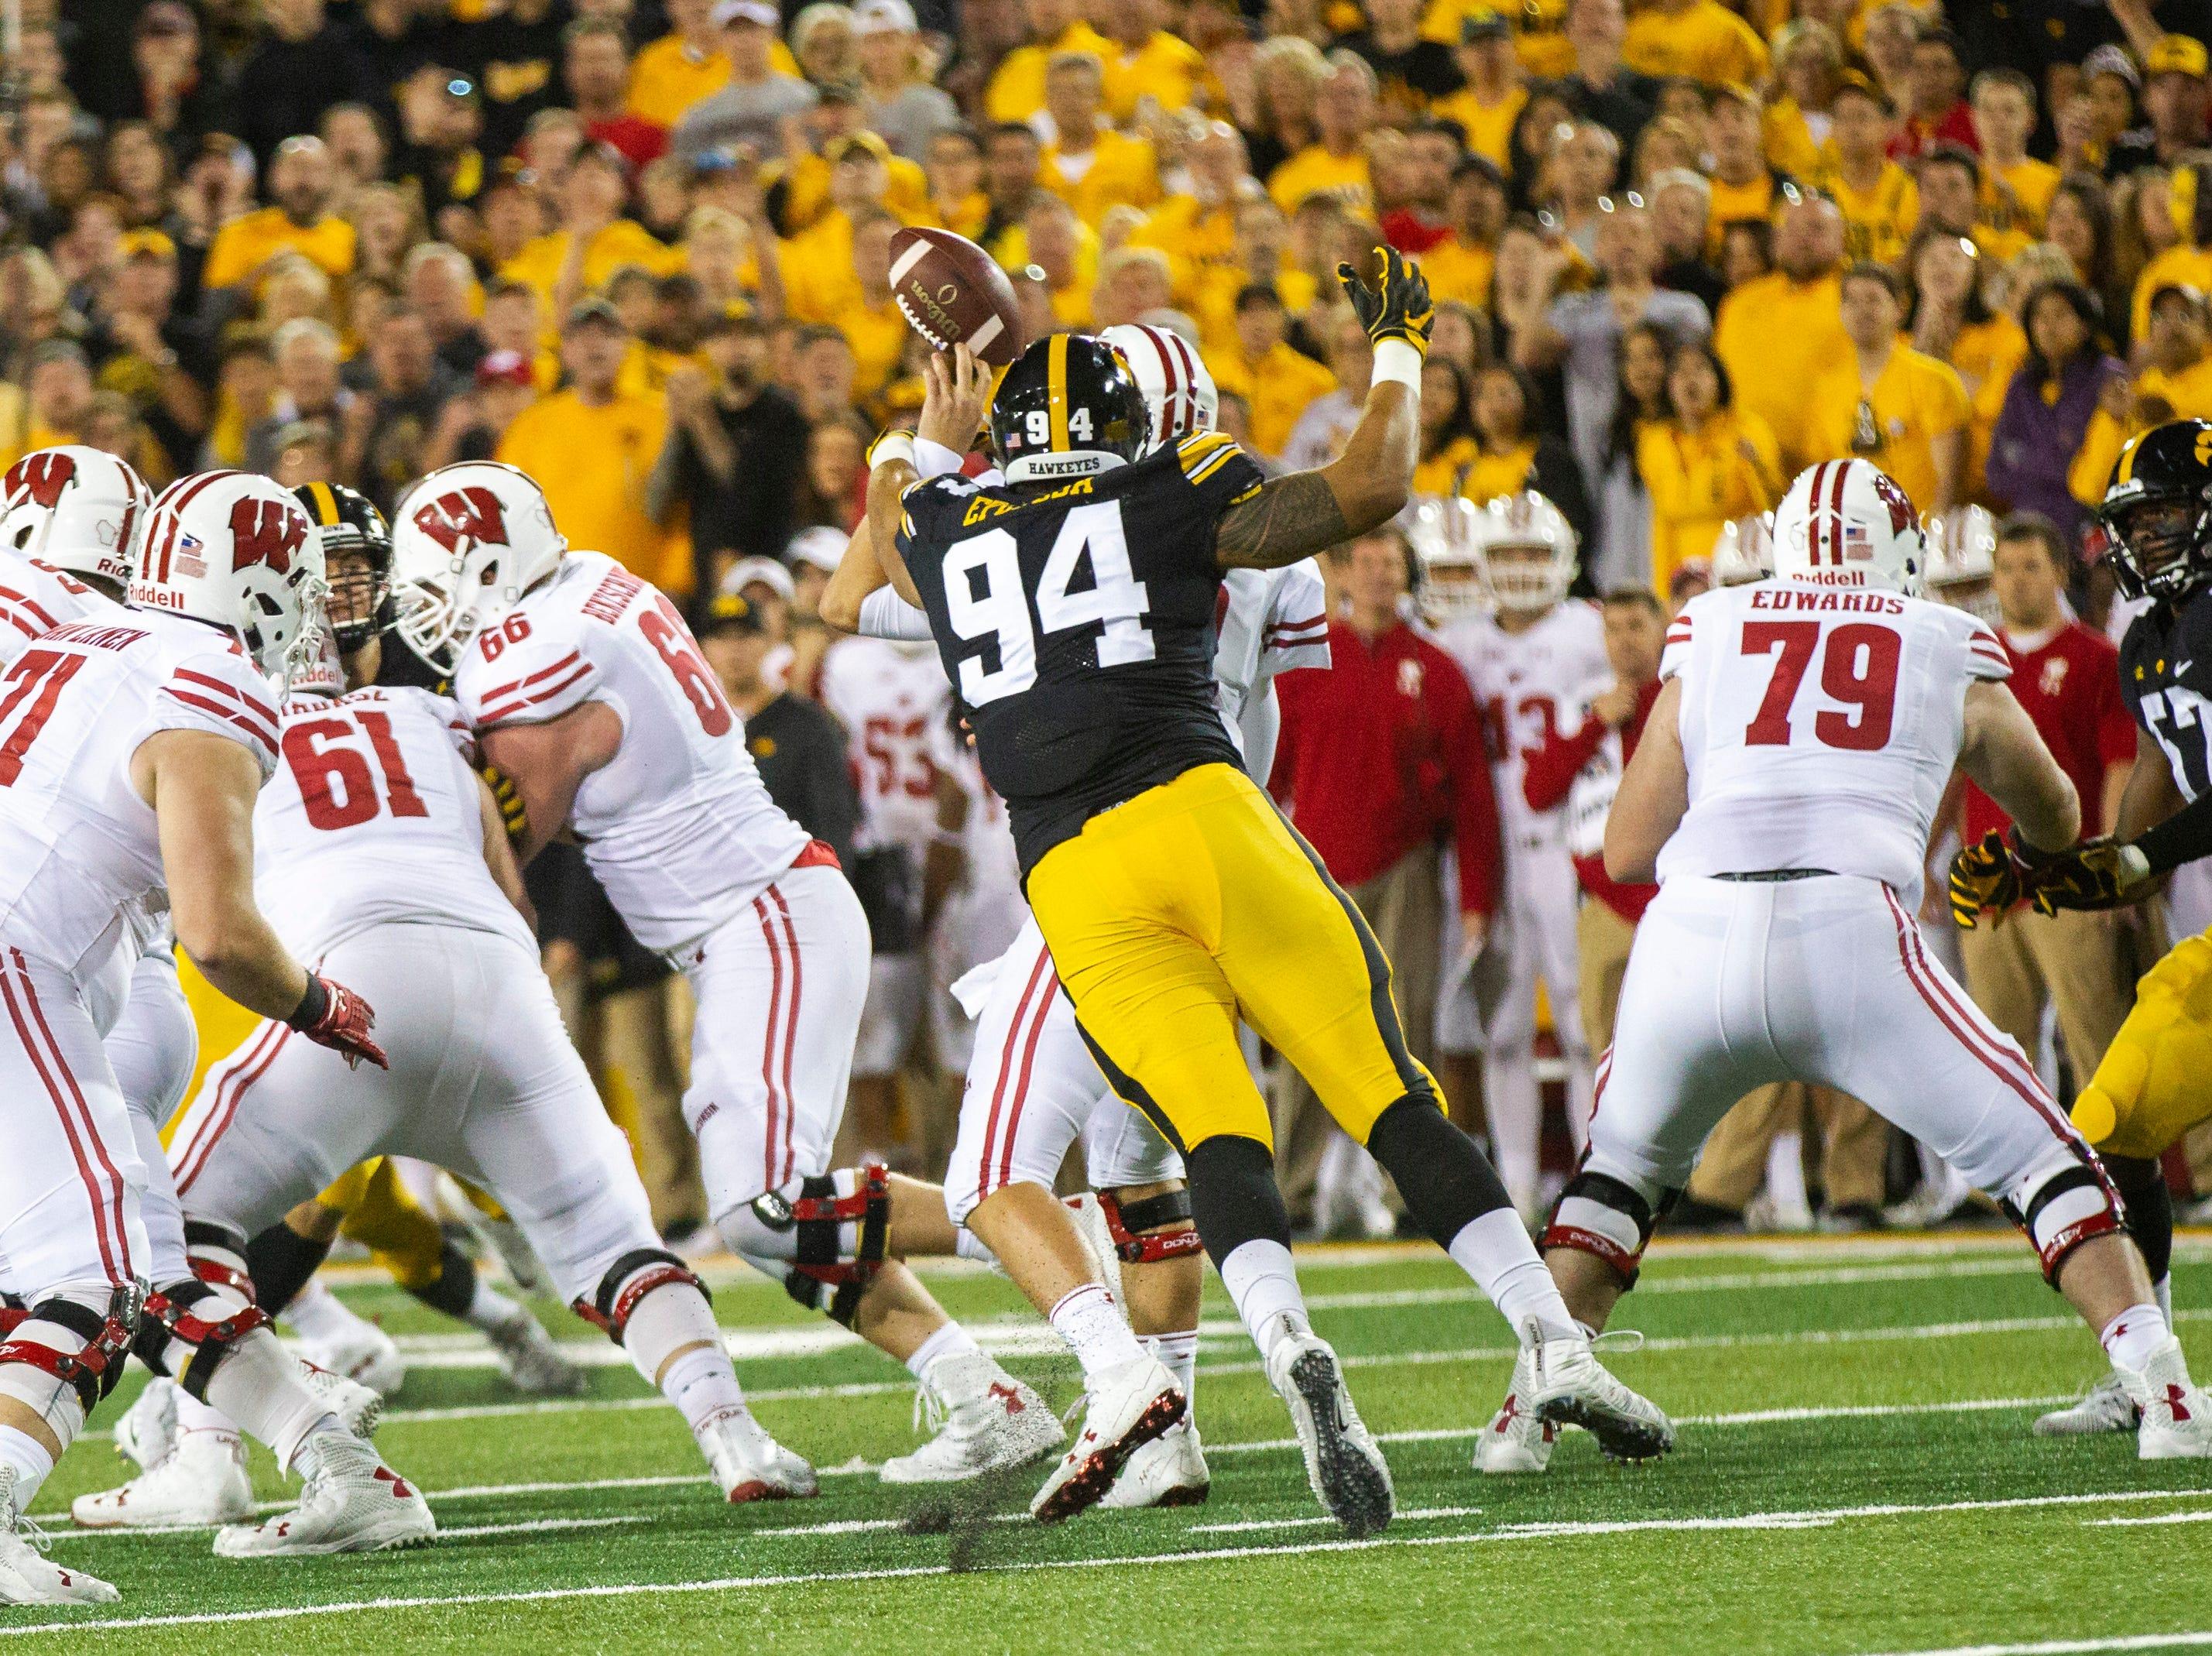 Iowa defensive end A.J. Epenesa (94) sacks Wisconsin quarterback Alex Hornibrook (12) during an NCAA football game on Saturday, Sept. 22, 2018, at Kinnick Stadium in Iowa City.